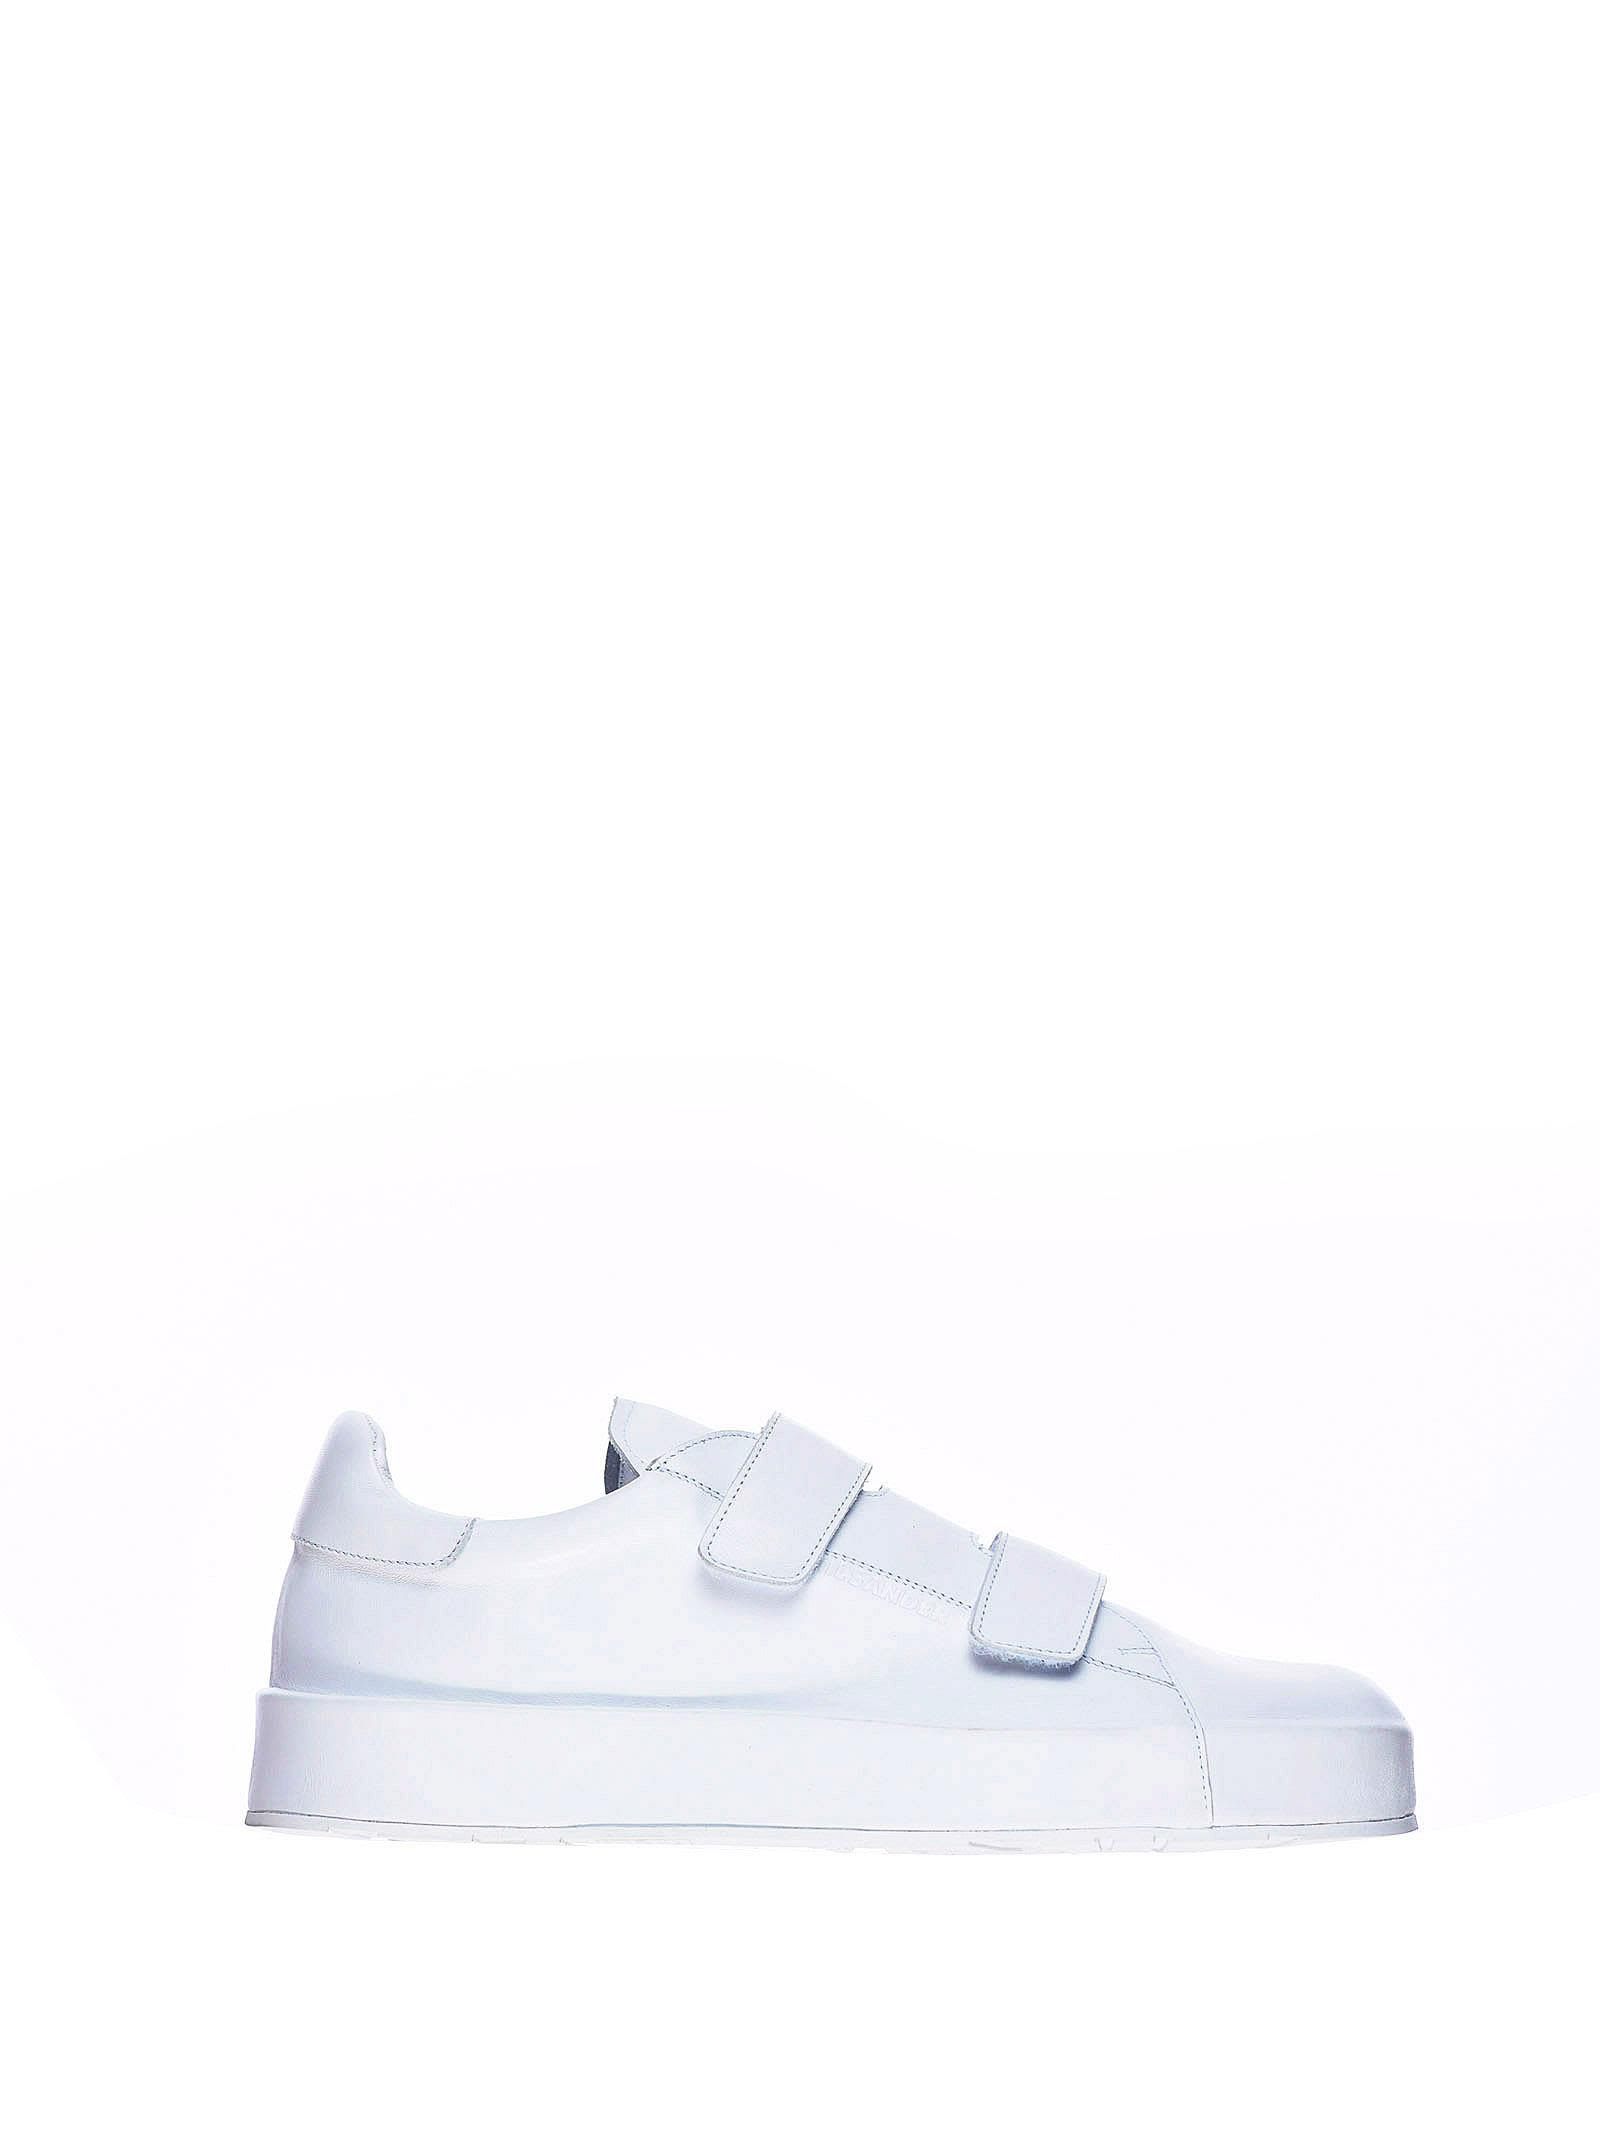 Jil Sander Jil Sander Sneaker White